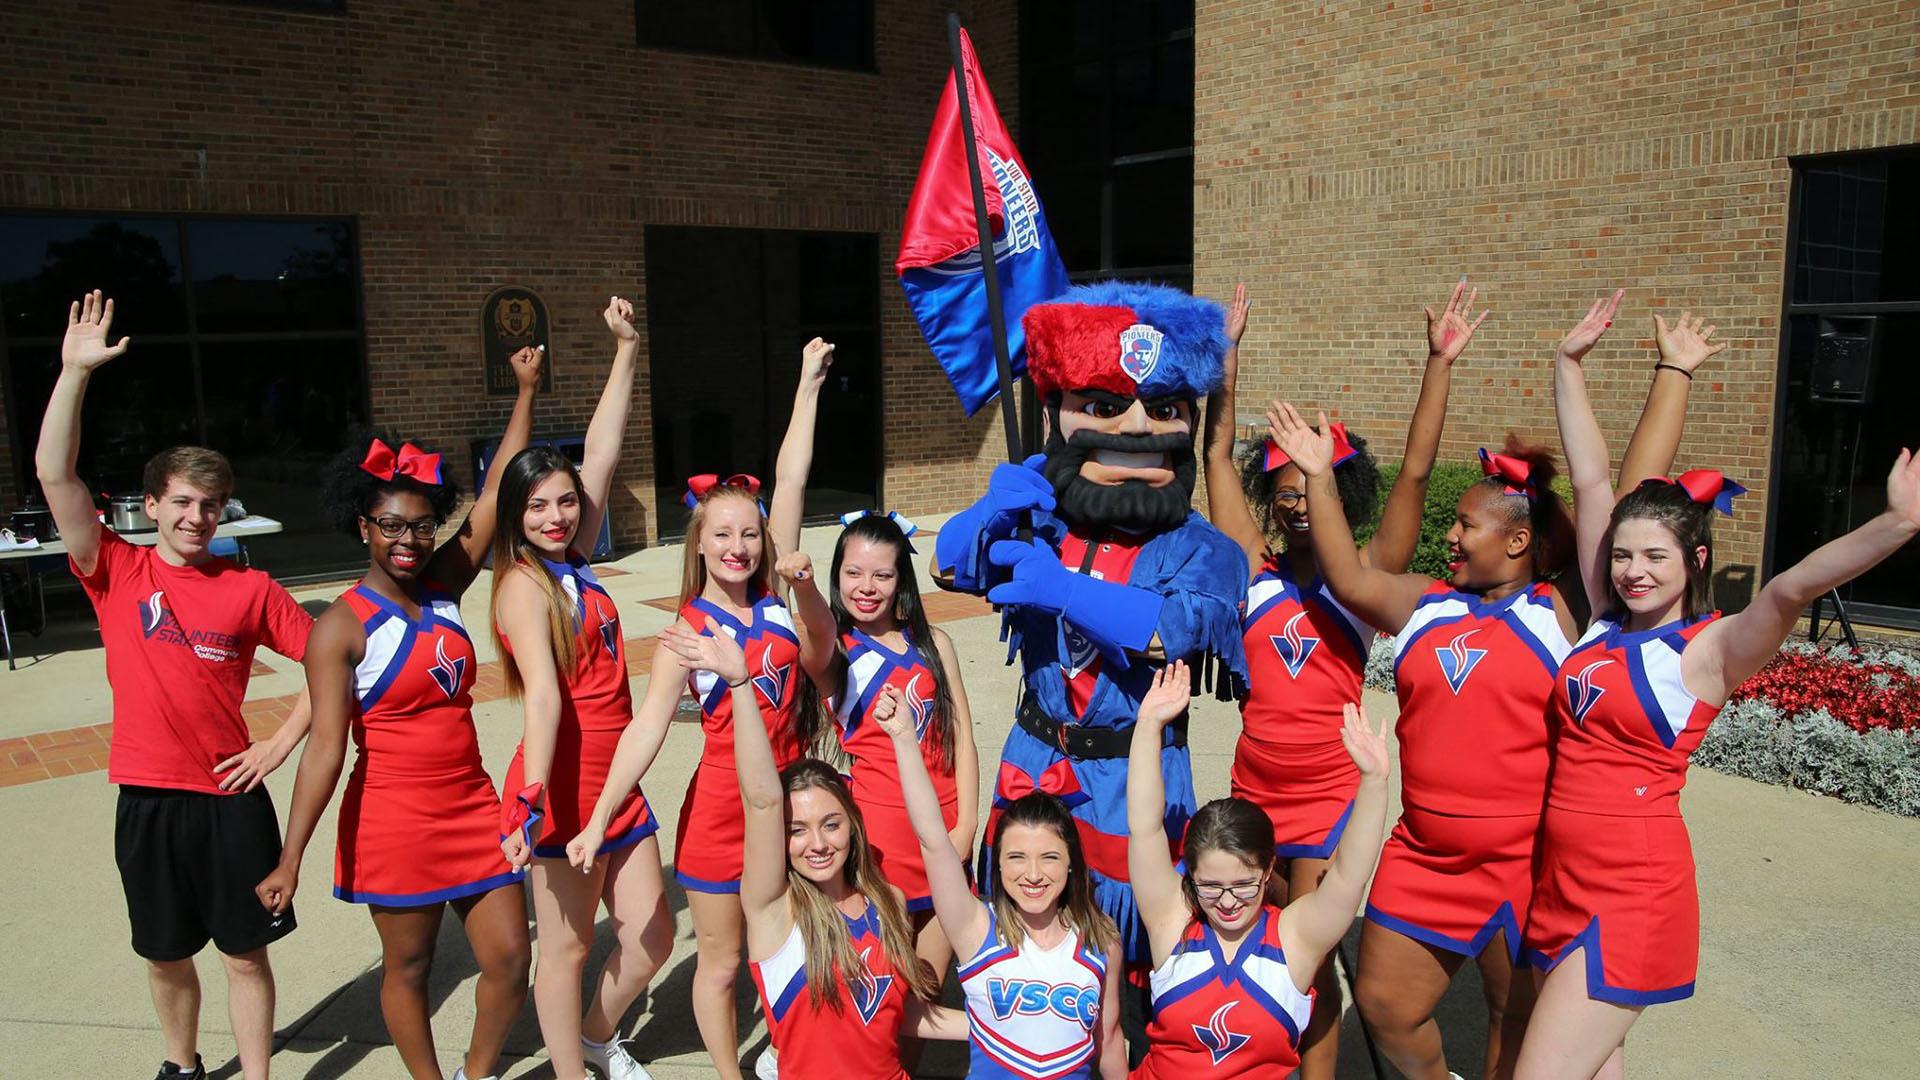 The New Pioneer Mascot Volunteer State Community College